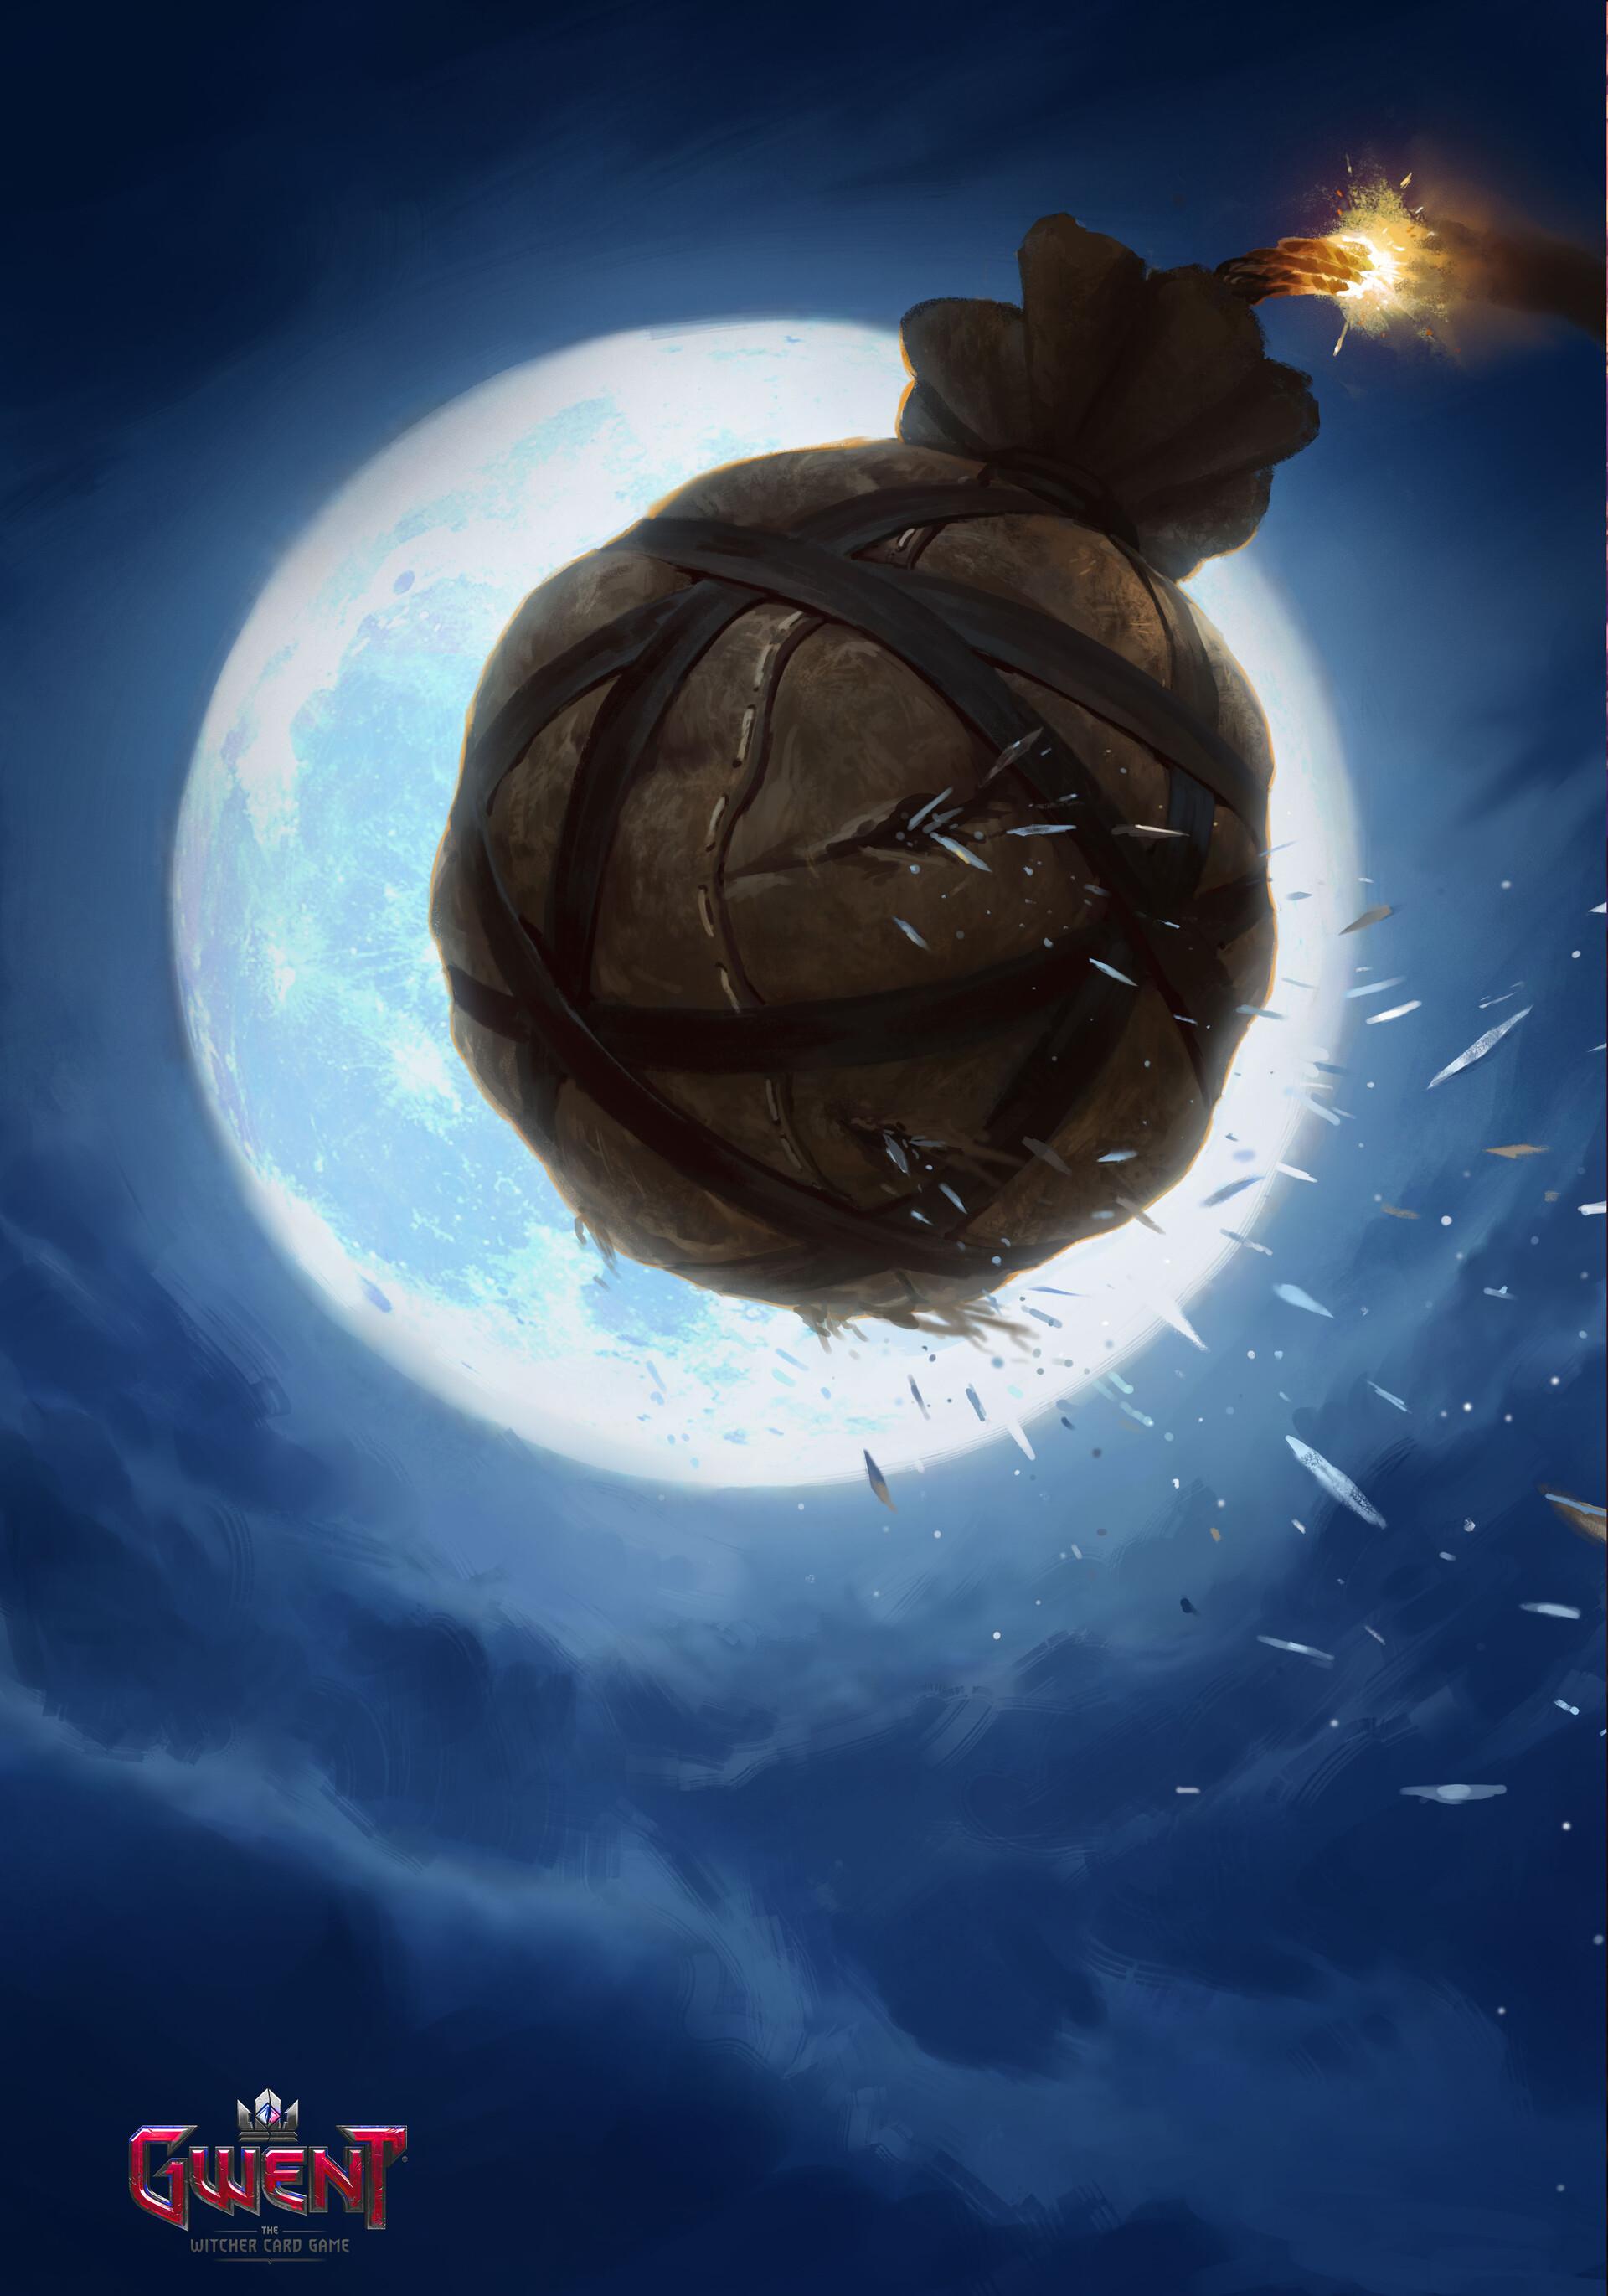 Manuel castanon 16 moondust bomb